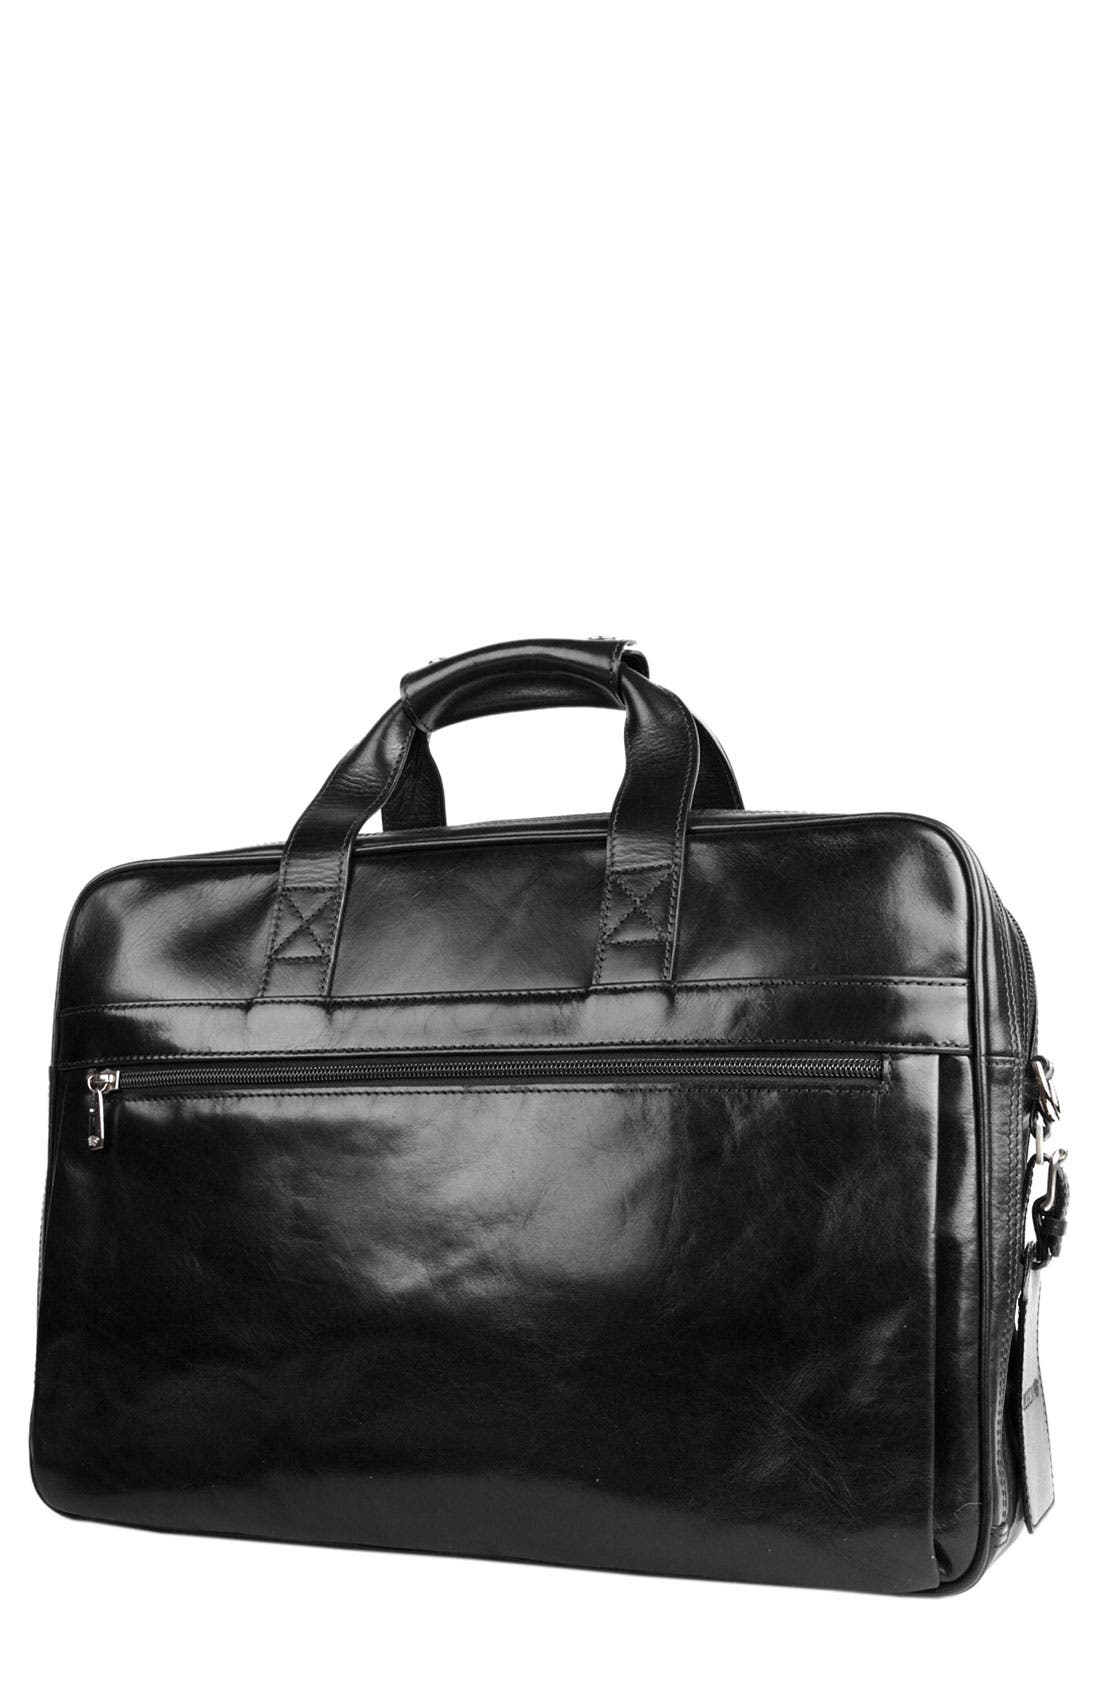 Double Compartment Leather Briefcase,                         Main,                         color, Black